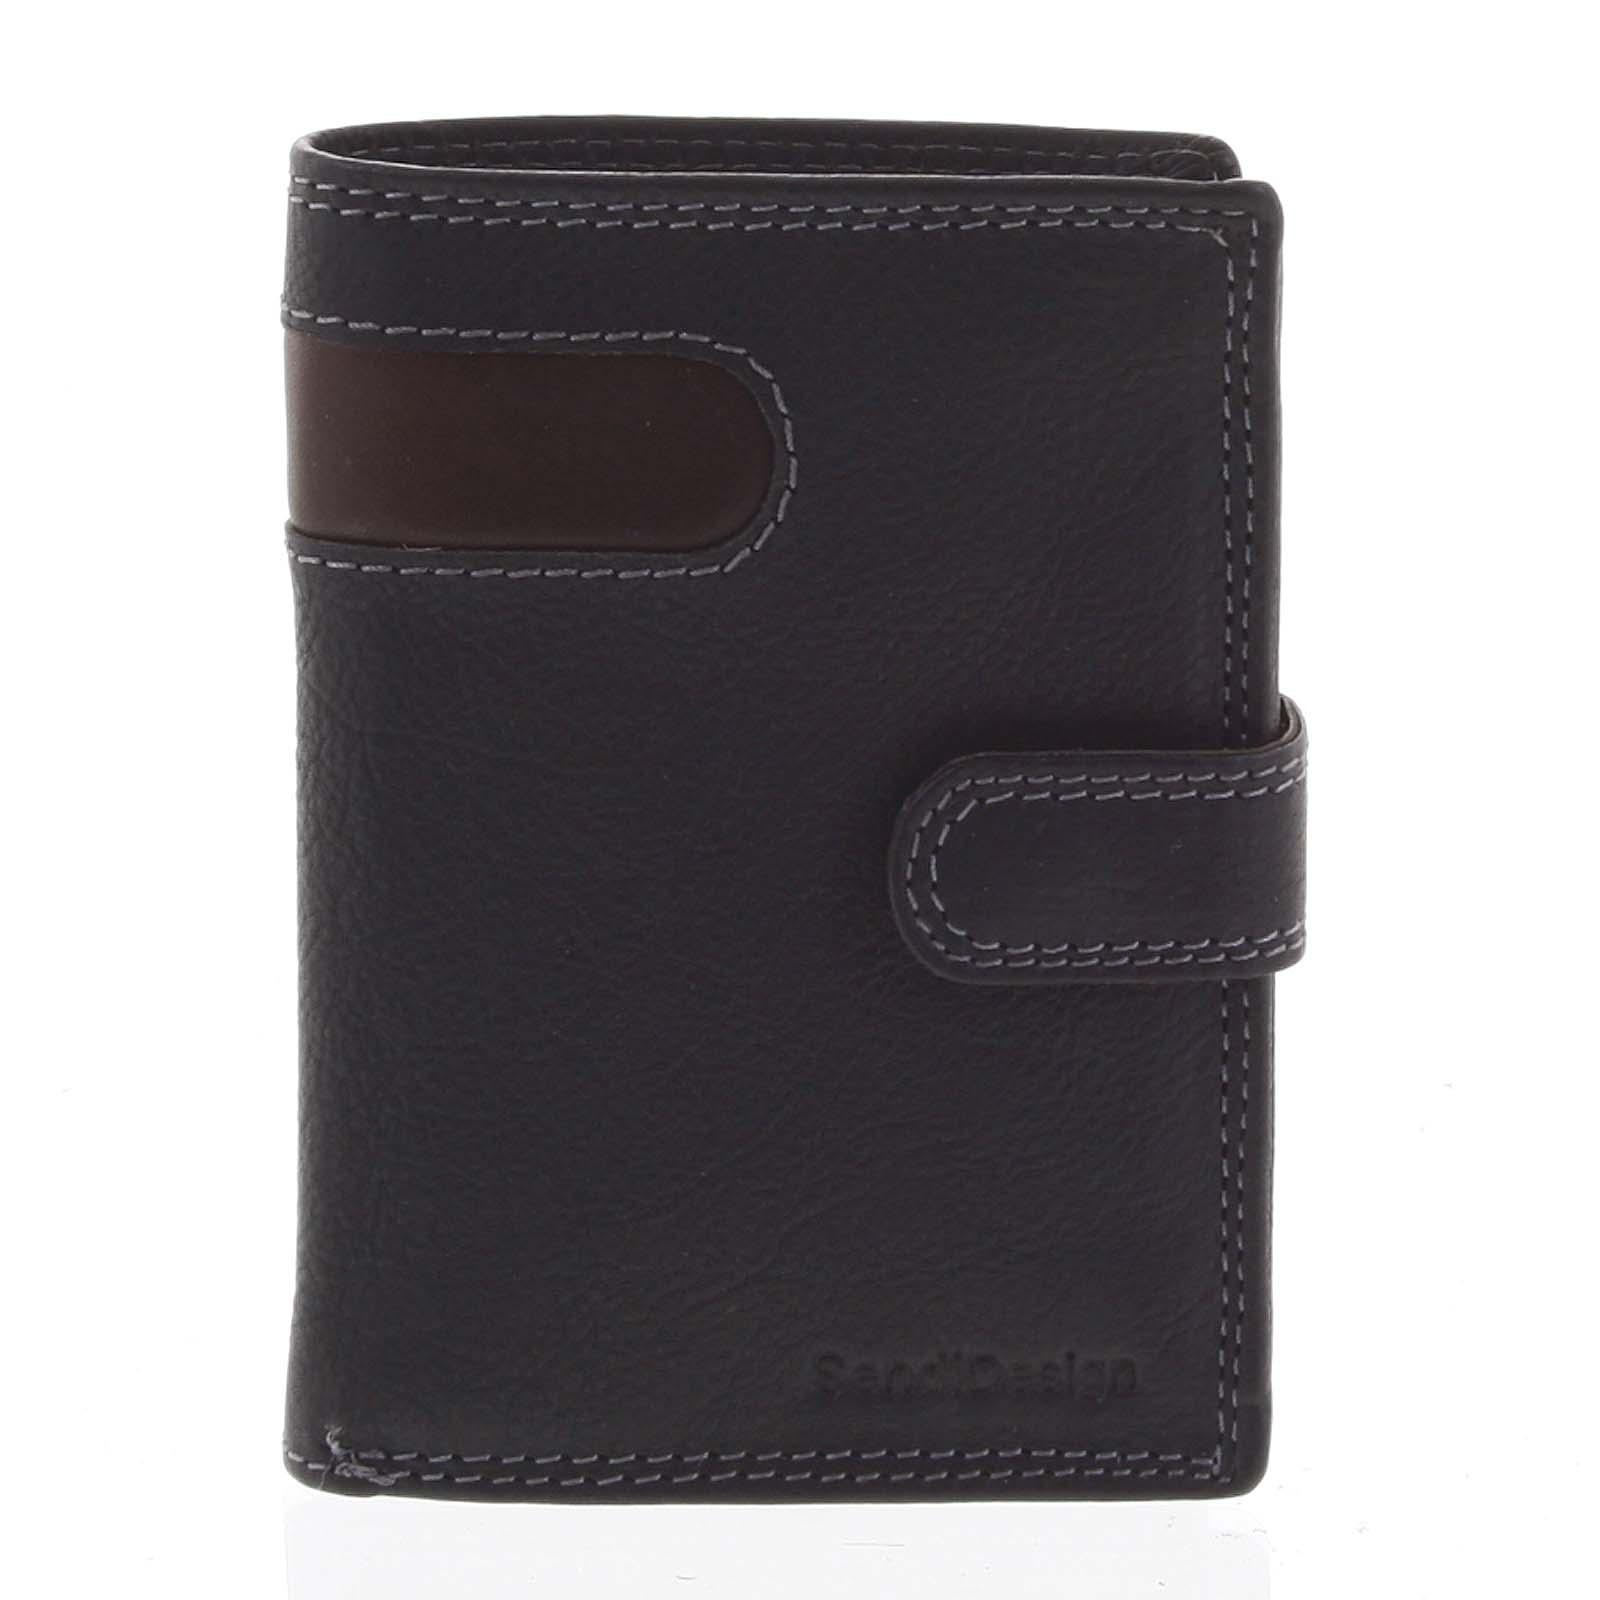 Pánská kožená peněženka černá - SendiDesign Elam